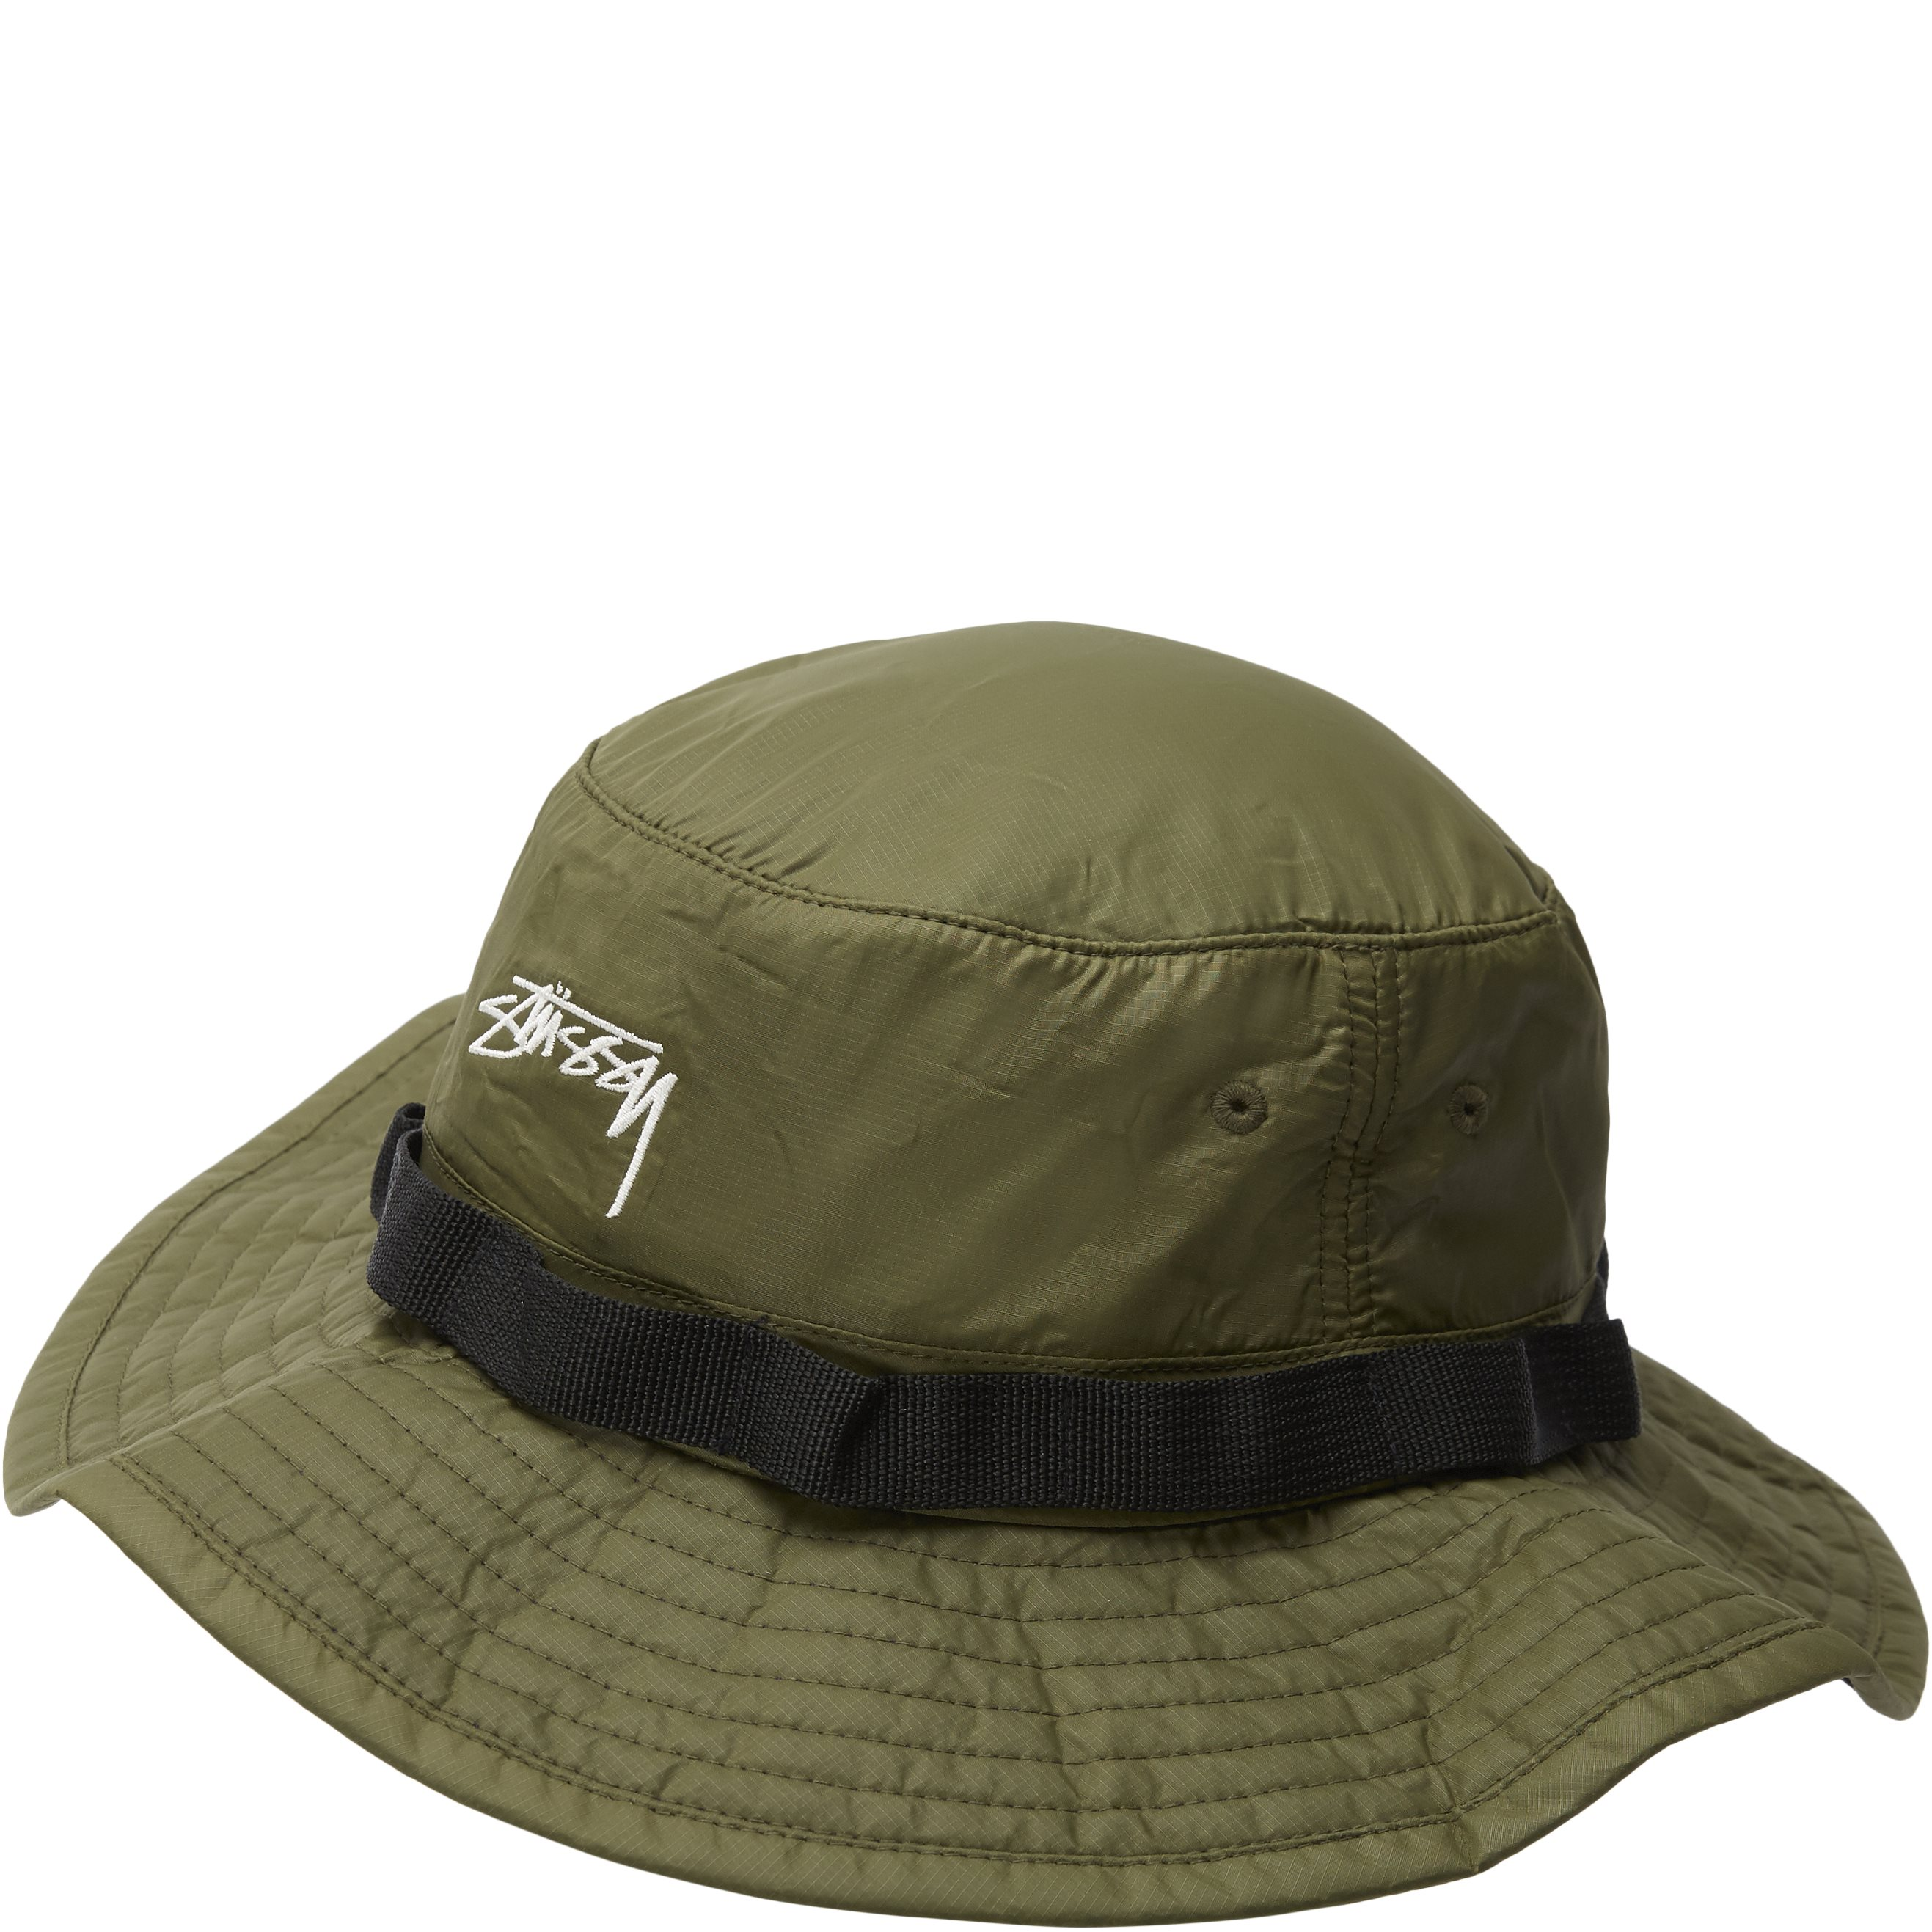 2 Tone Nylon Hat - Caps - Grøn